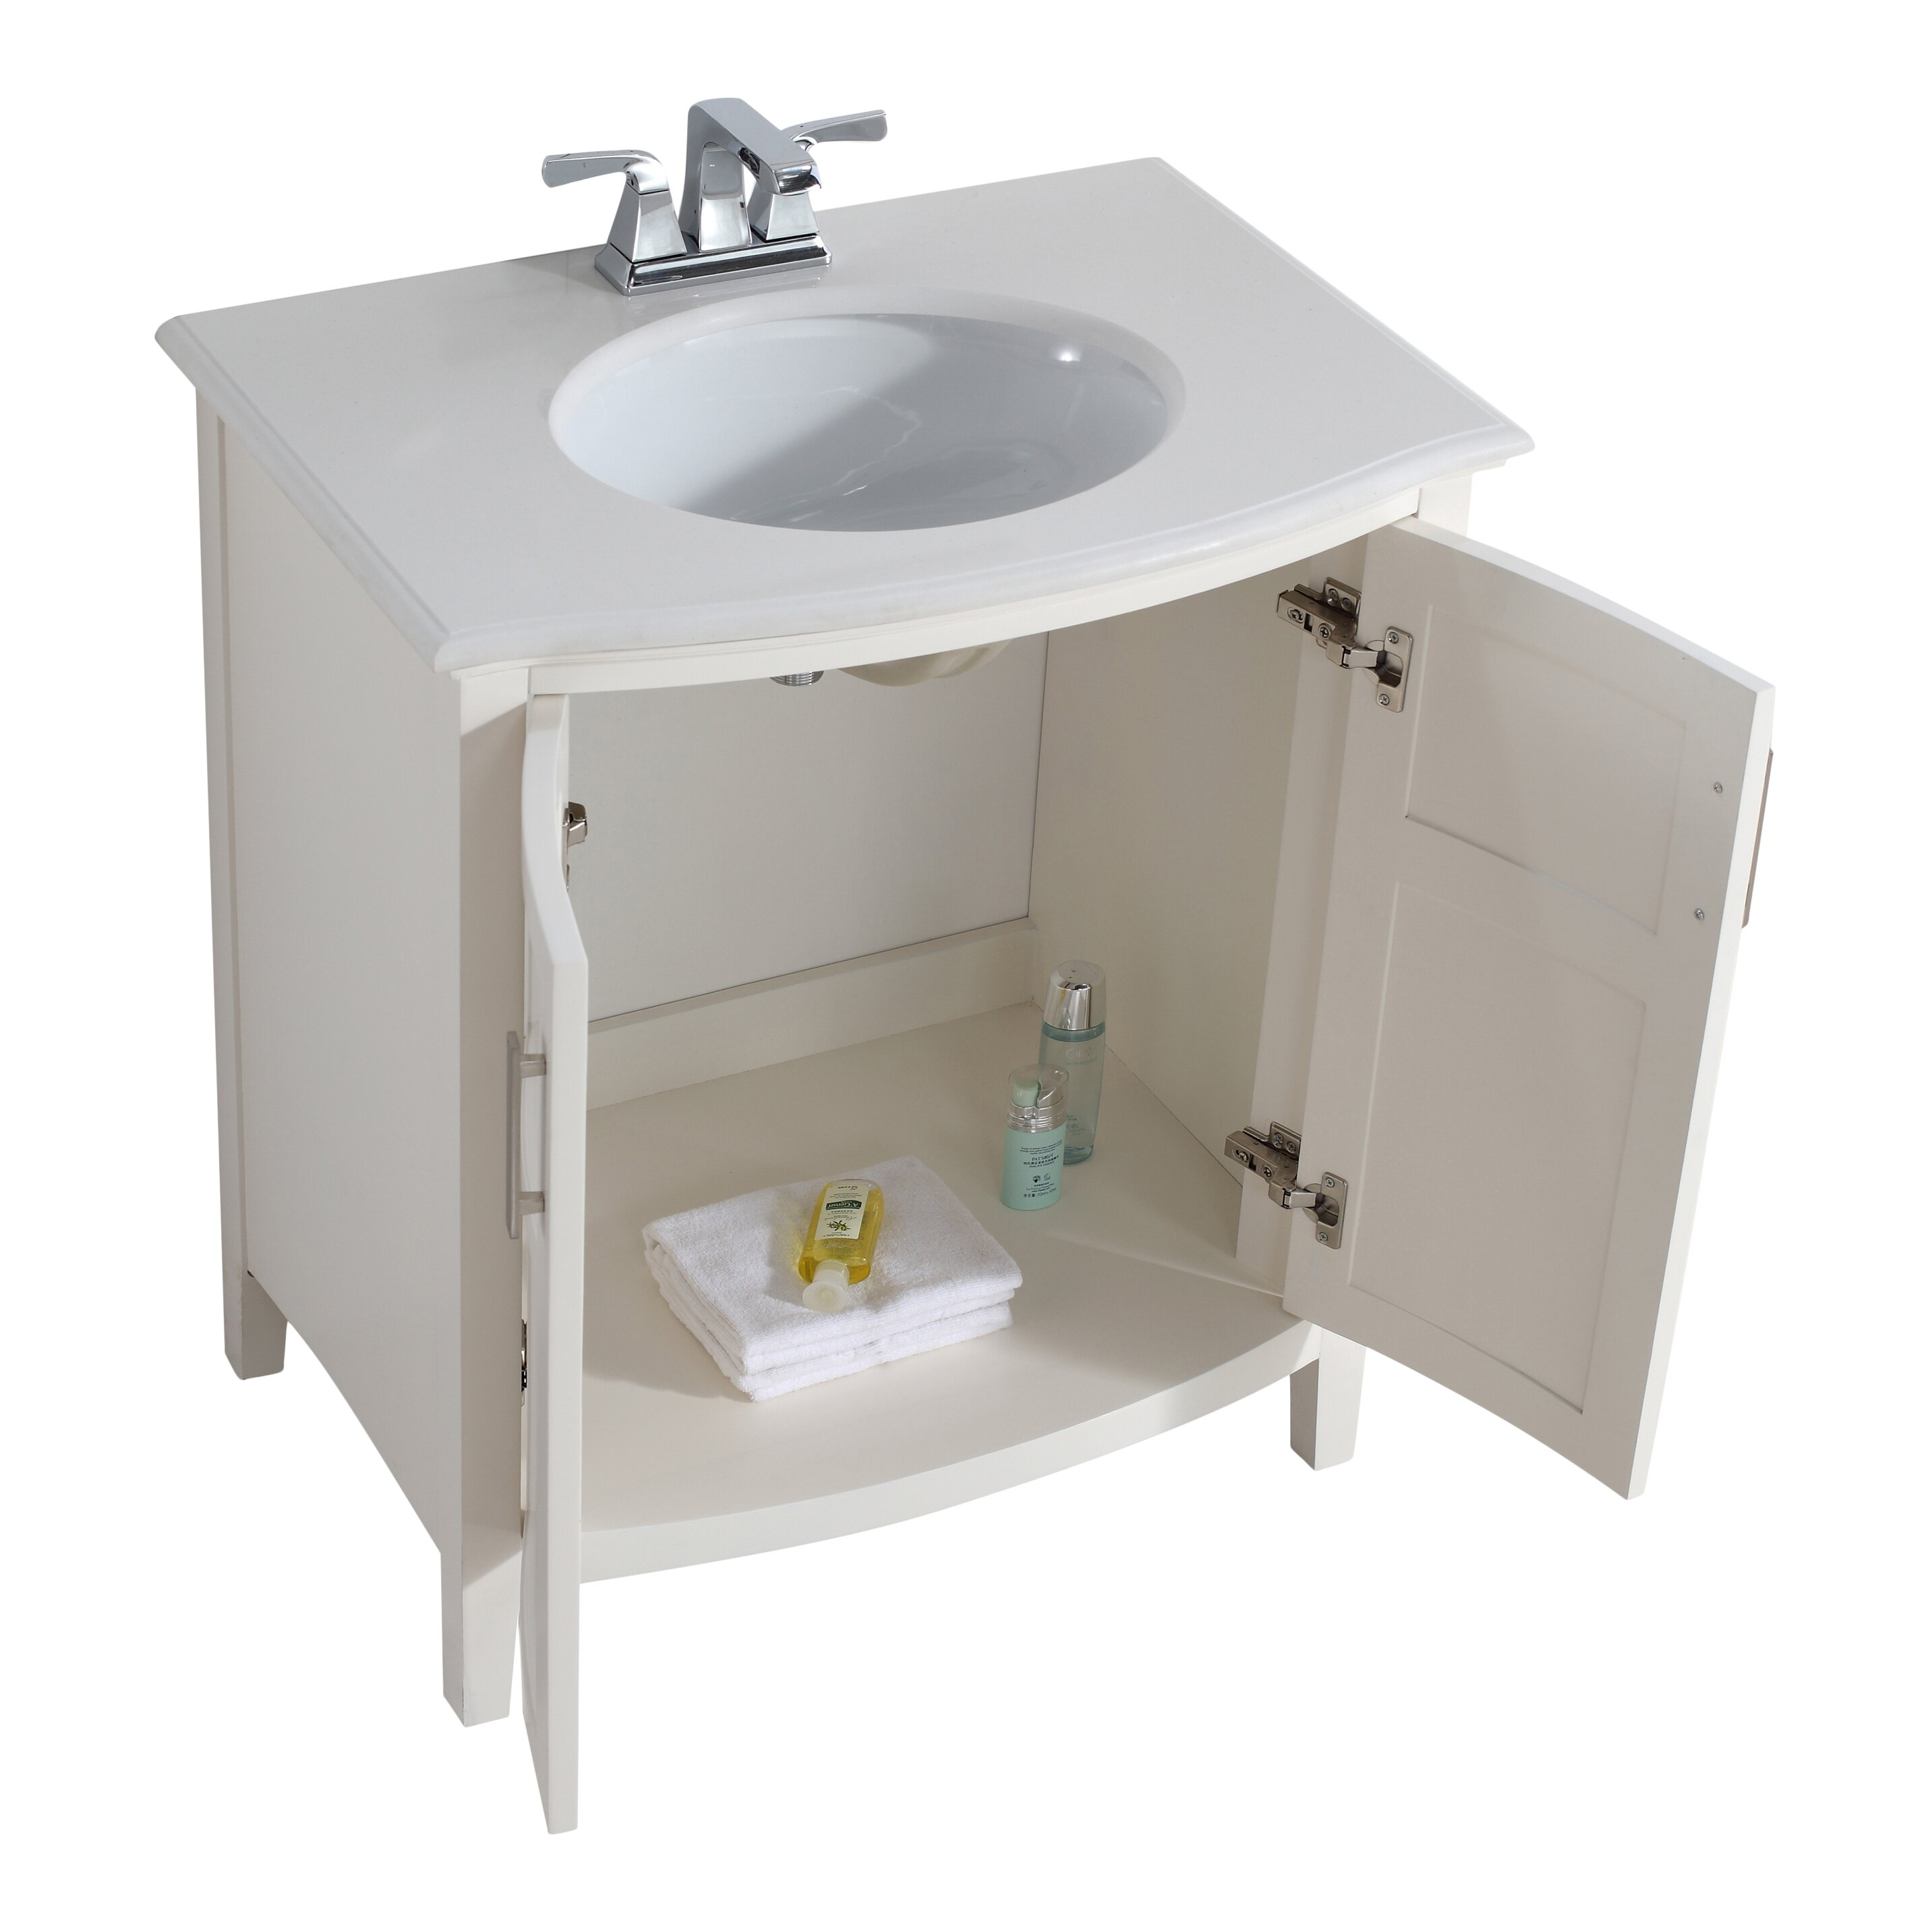 simpli home winston 31quot single rounded front bathroom vanity set - Ensemble Vanite Armoire